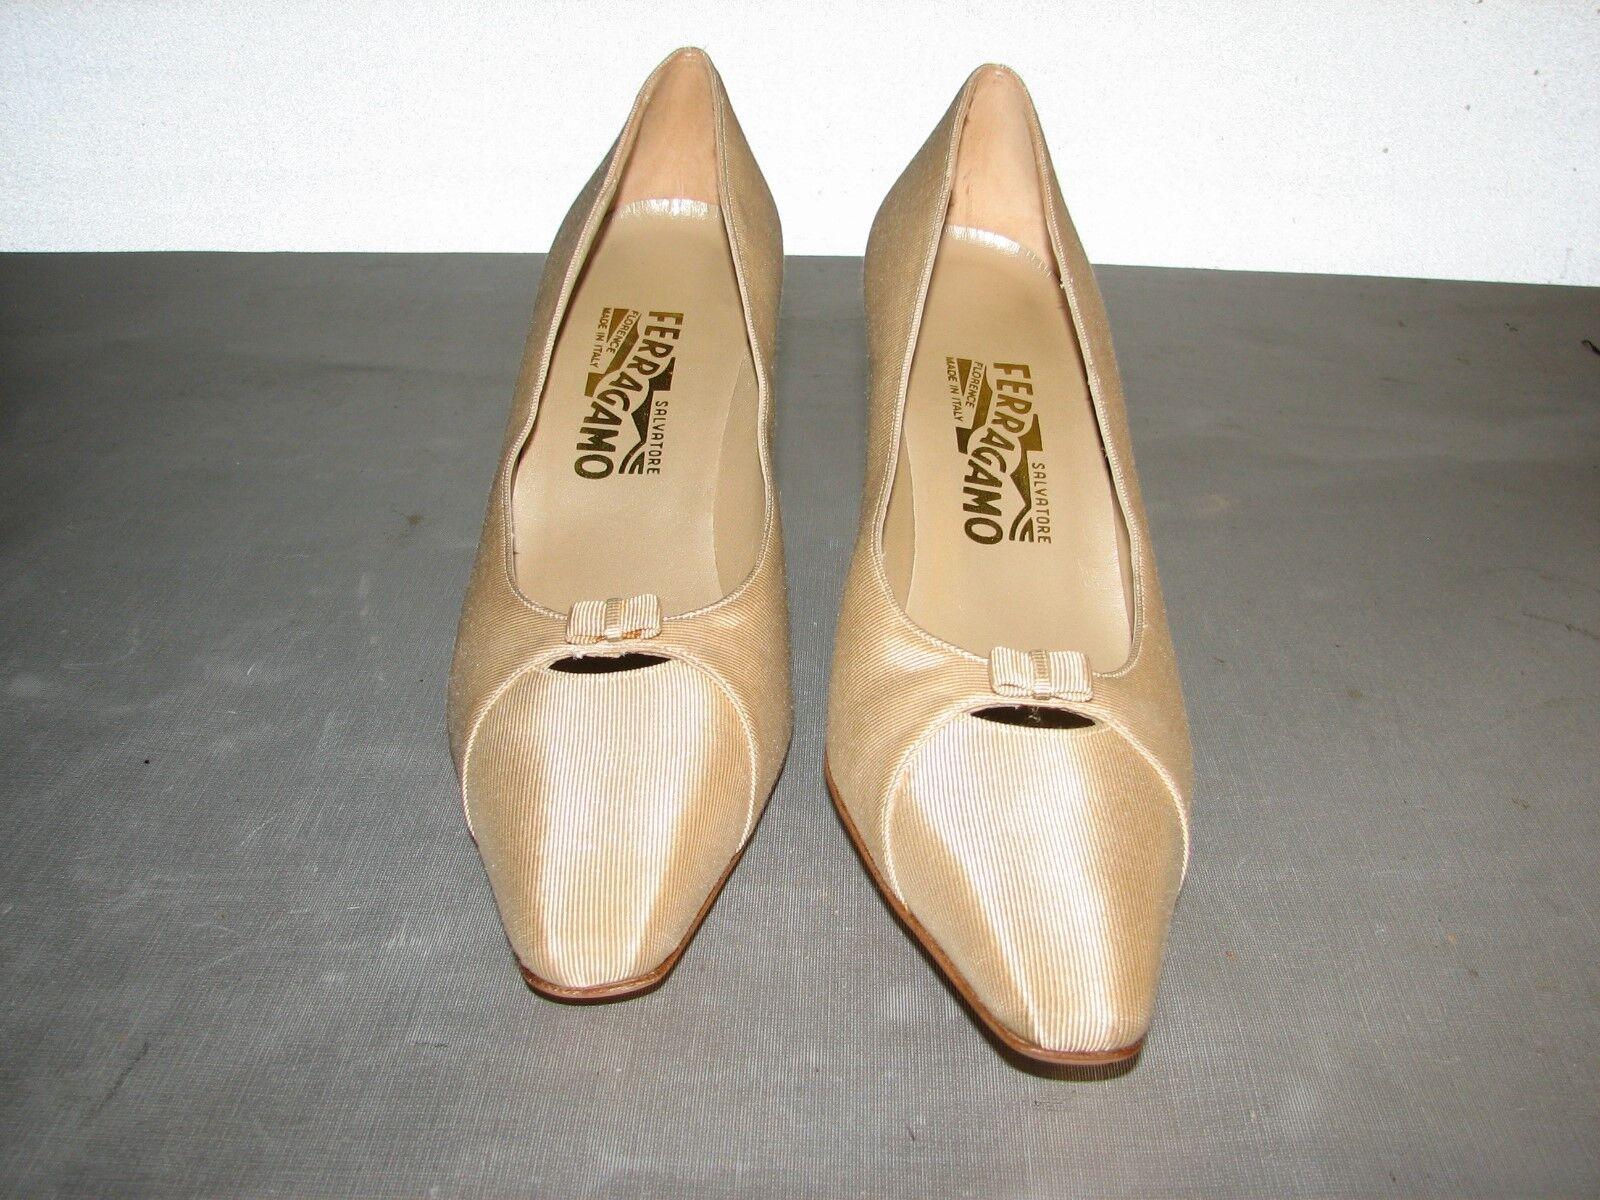 $399 New Salvatore Ferragamo Women Beige Satin Heels Heels Satin Shoes 10 2A 23102a